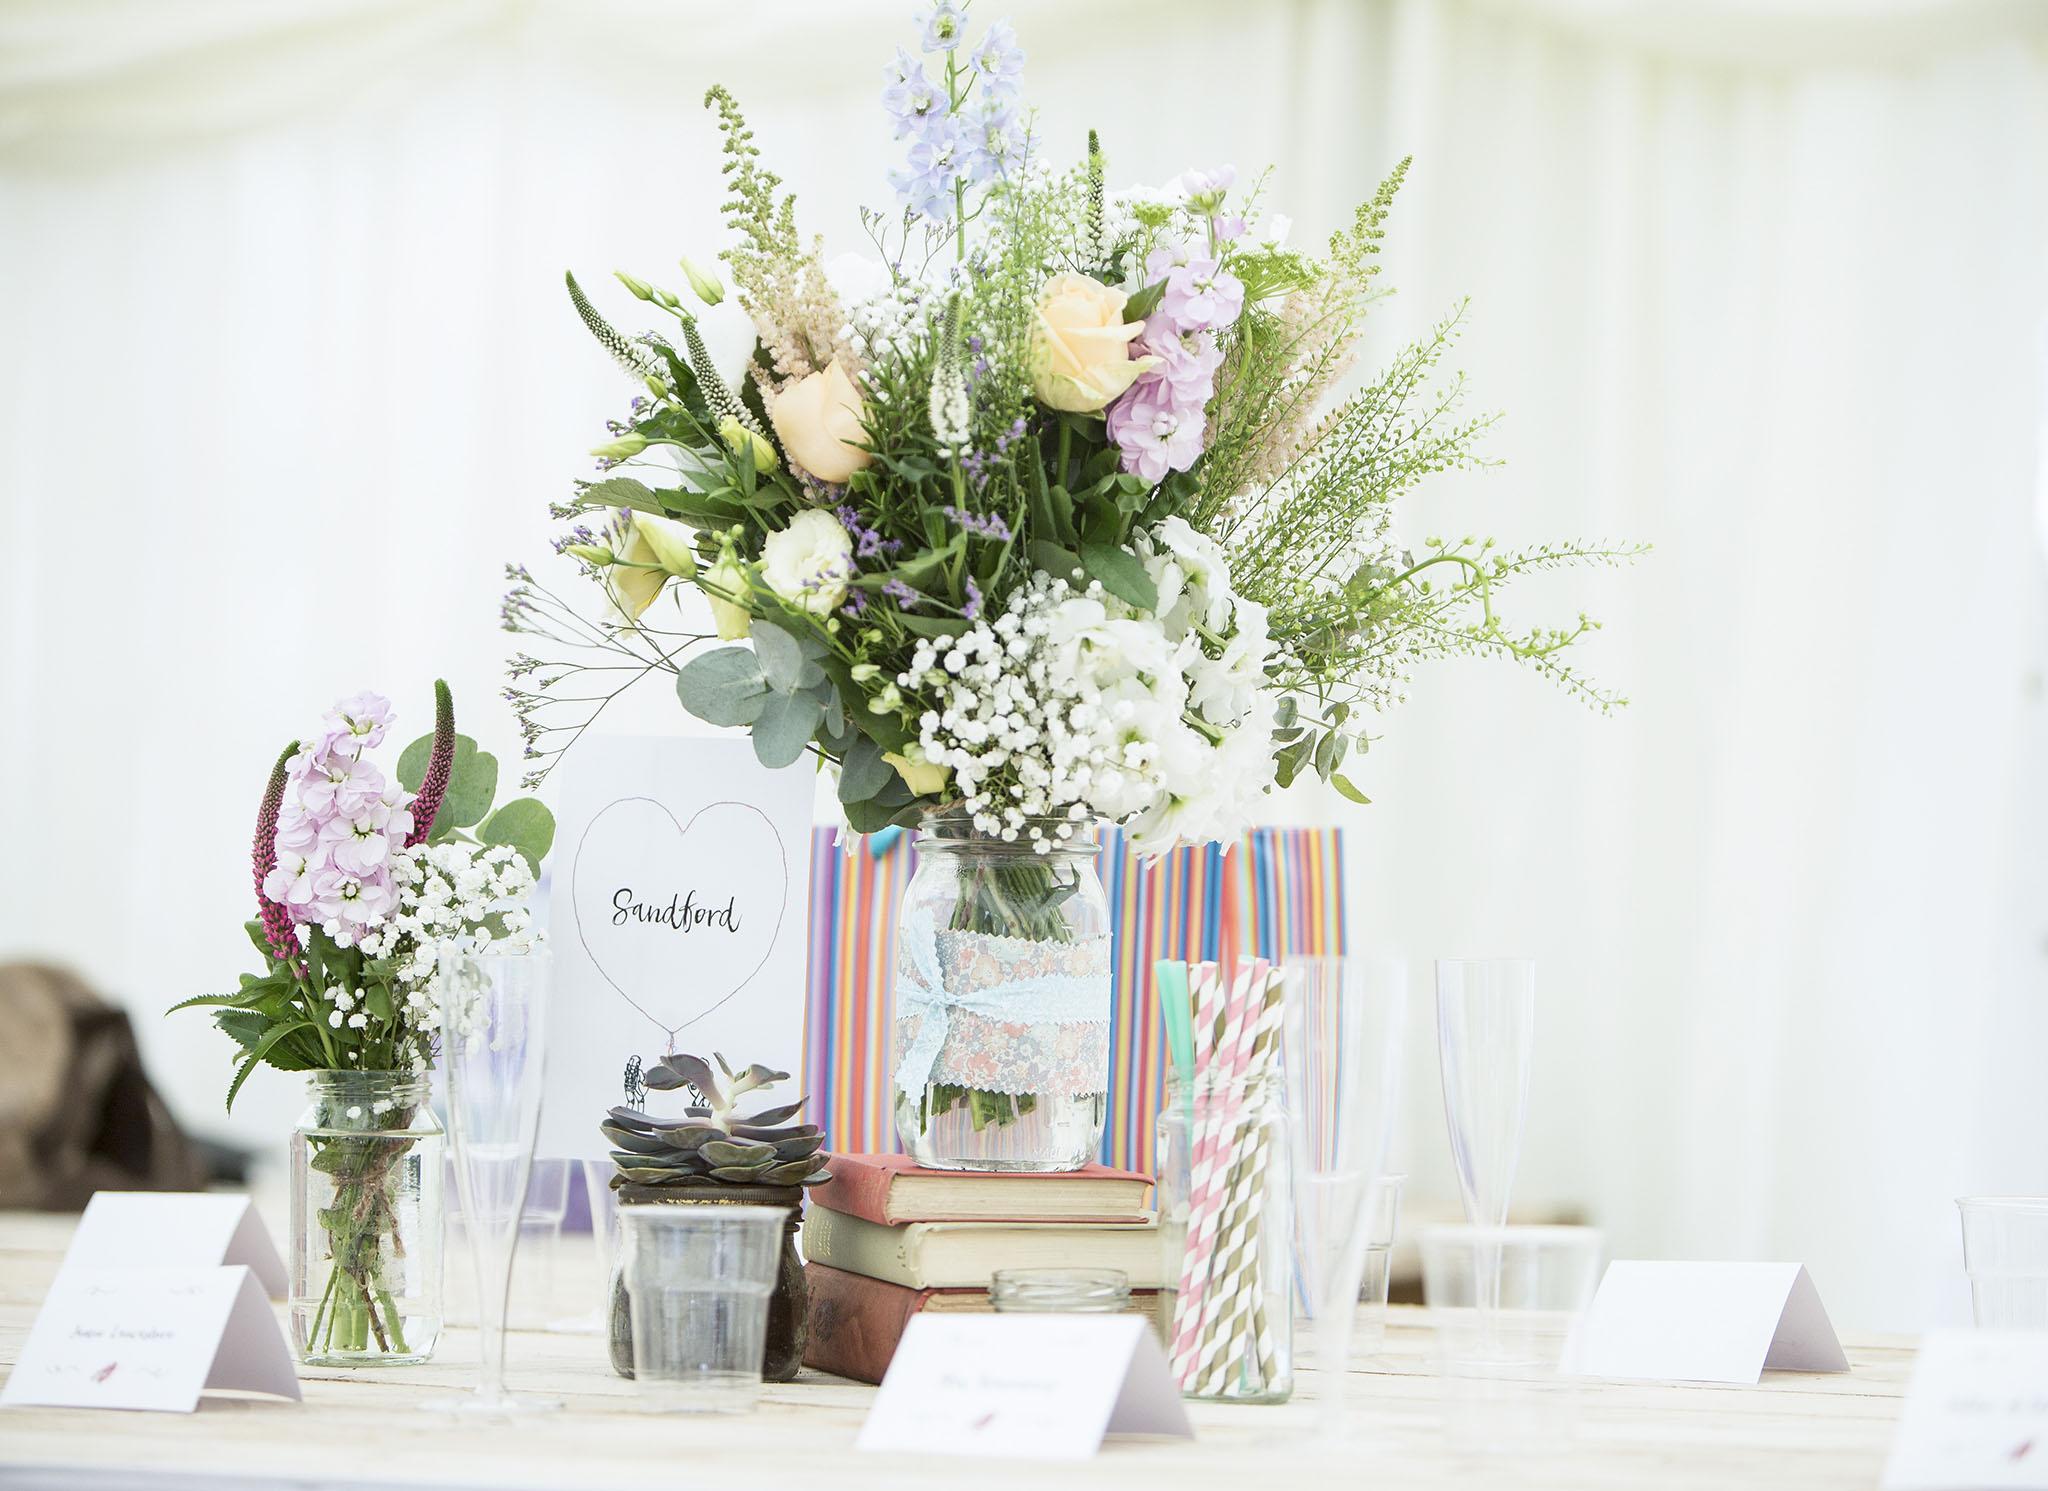 elizabethgphotography_kingslangley_hertfordshire_fineart_wedding_pottersbar_matt_katie_pegg_01.jpg